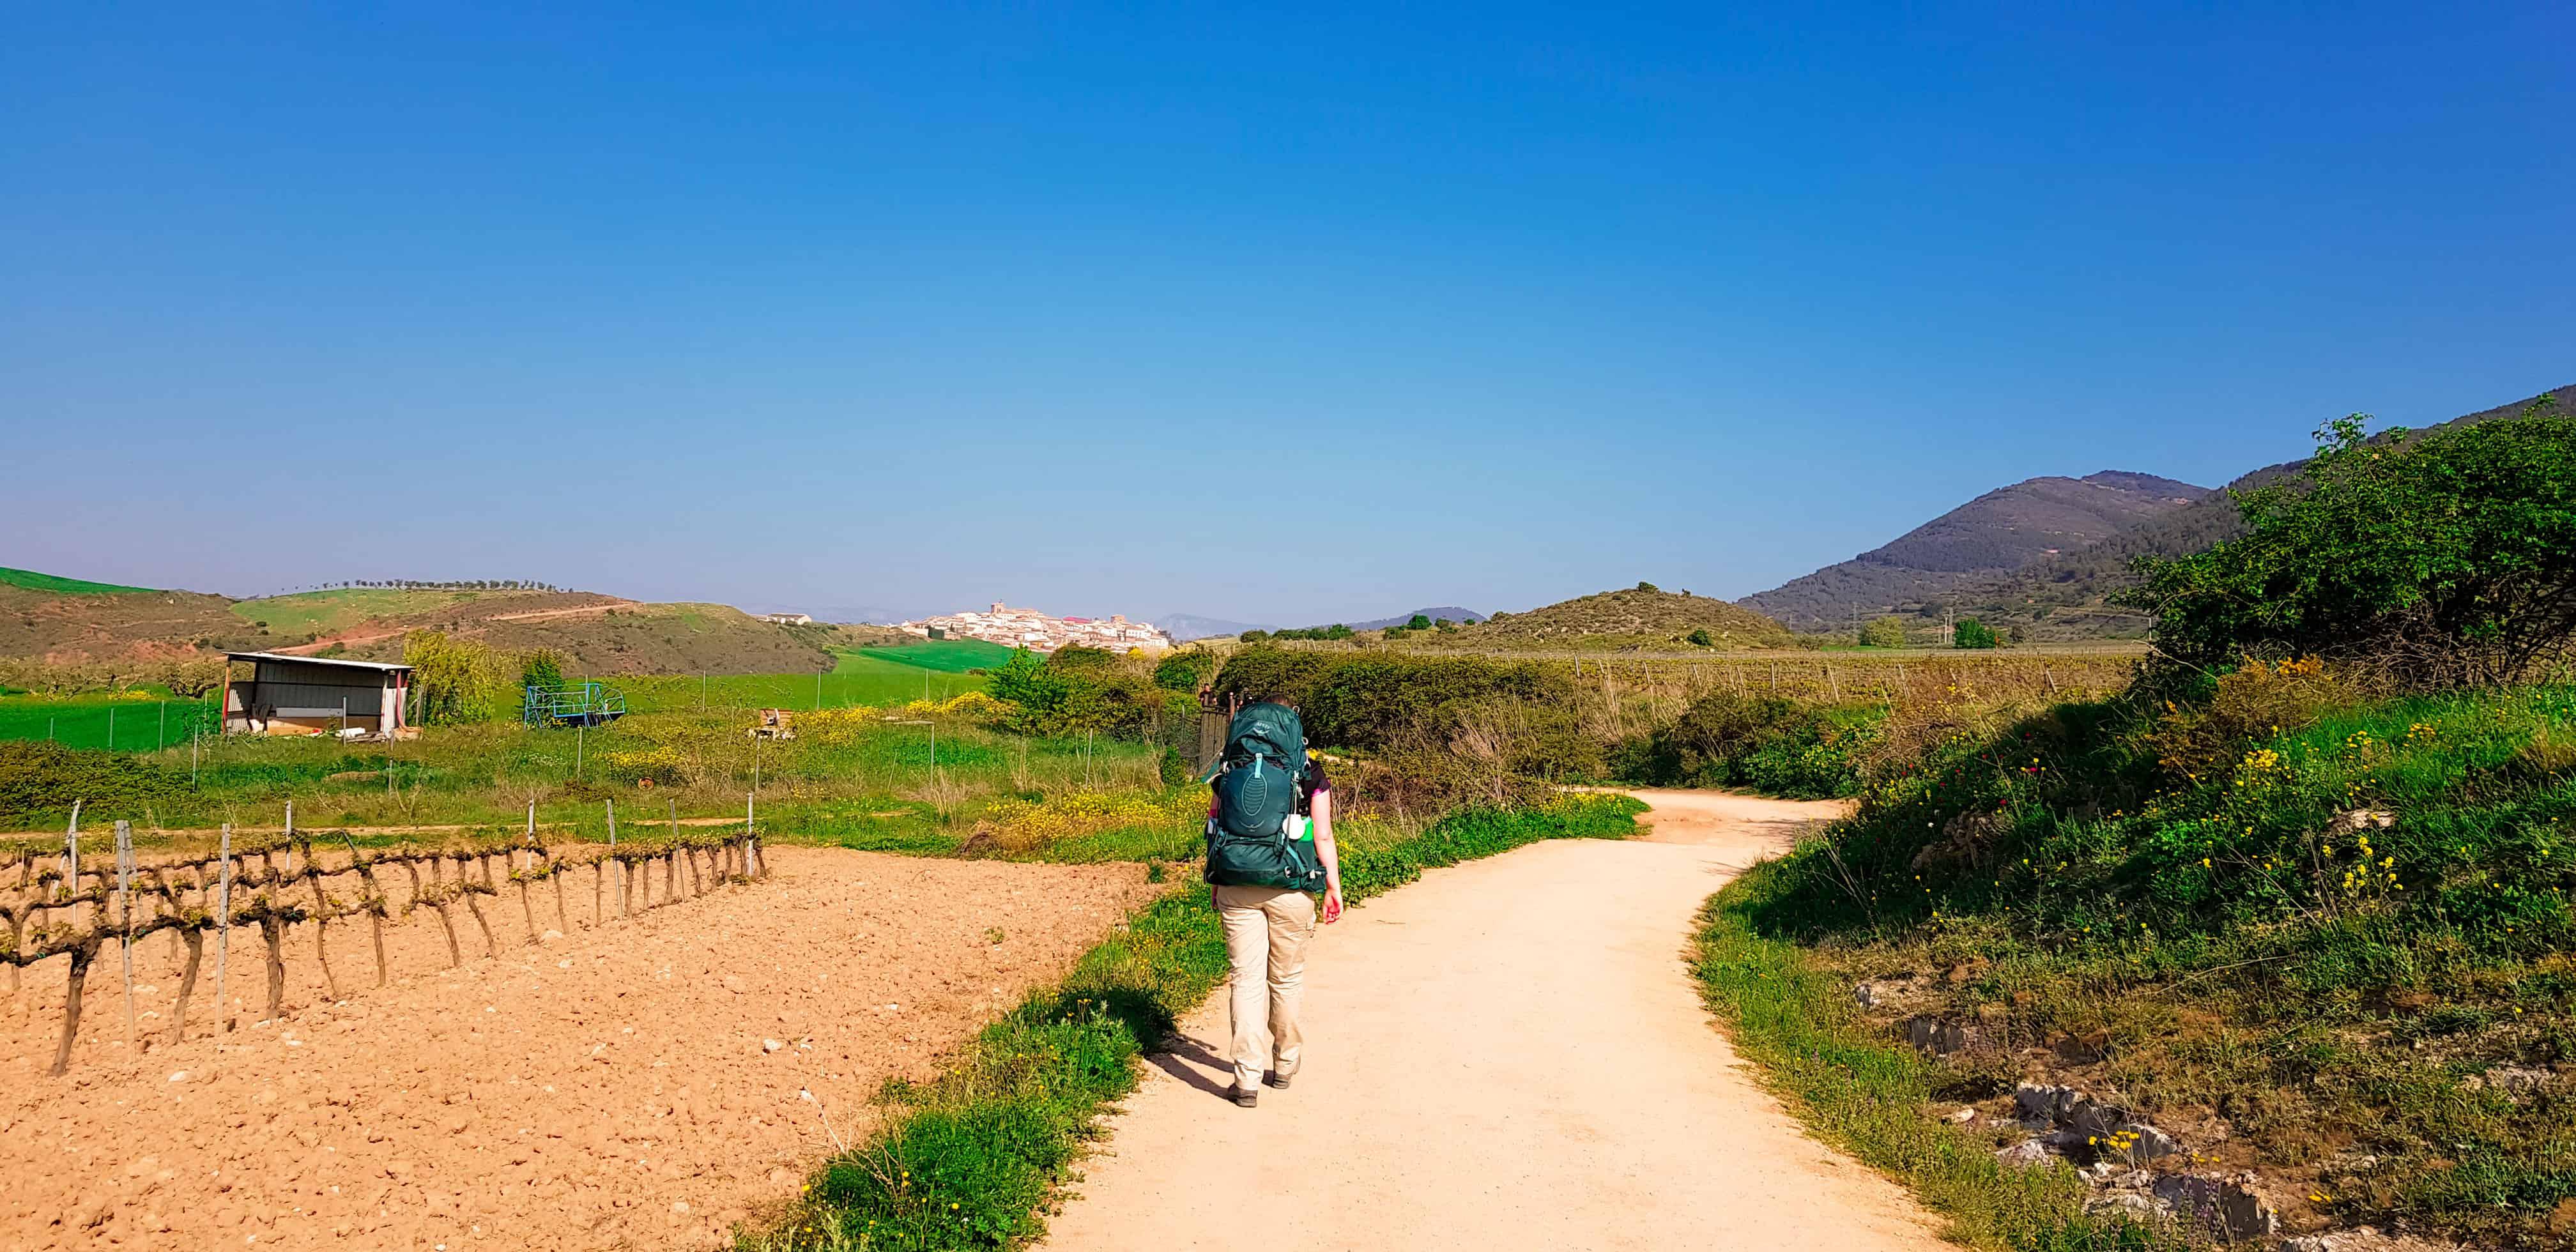 Puenta la Reina naar Villatuerta - Camino Frances - HappyHikers